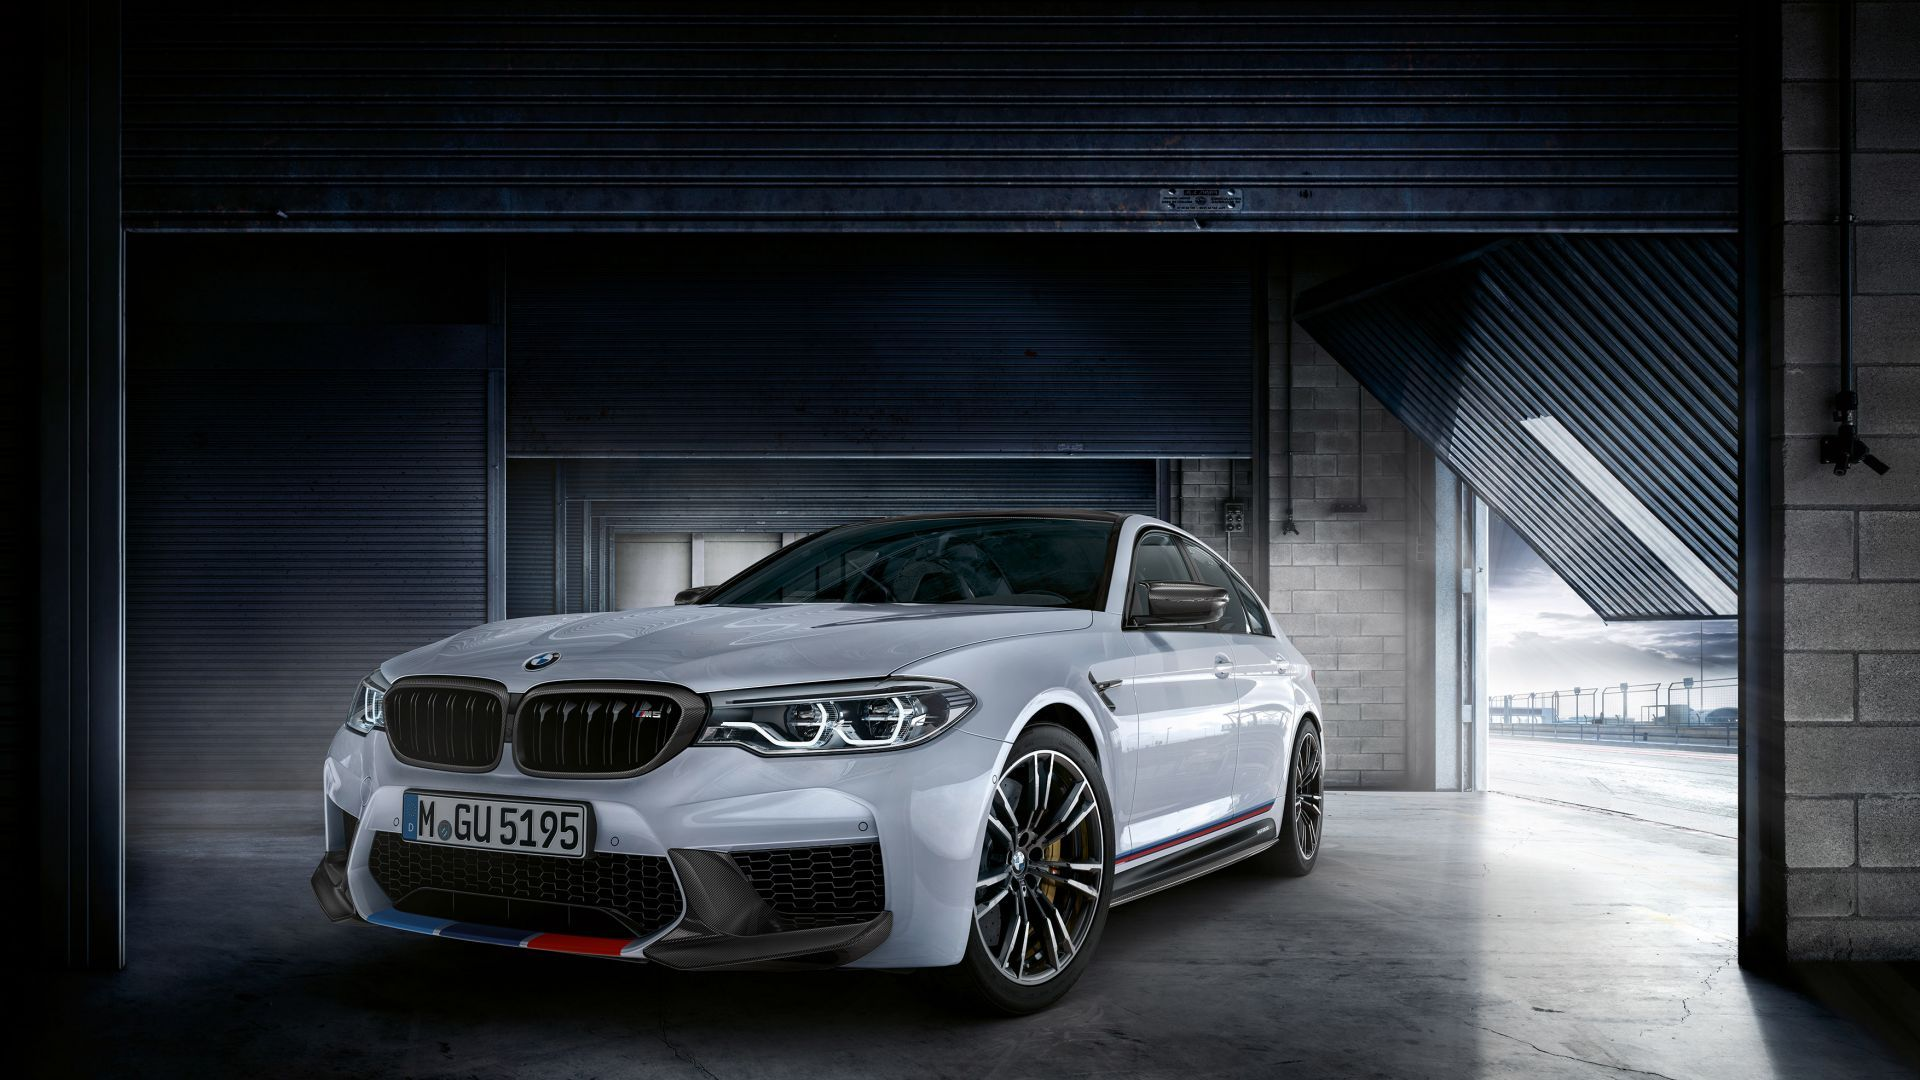 Mw M5 M Performance Cars 2018 4k Horizontal Bmw M5 Bmw Performance Parts